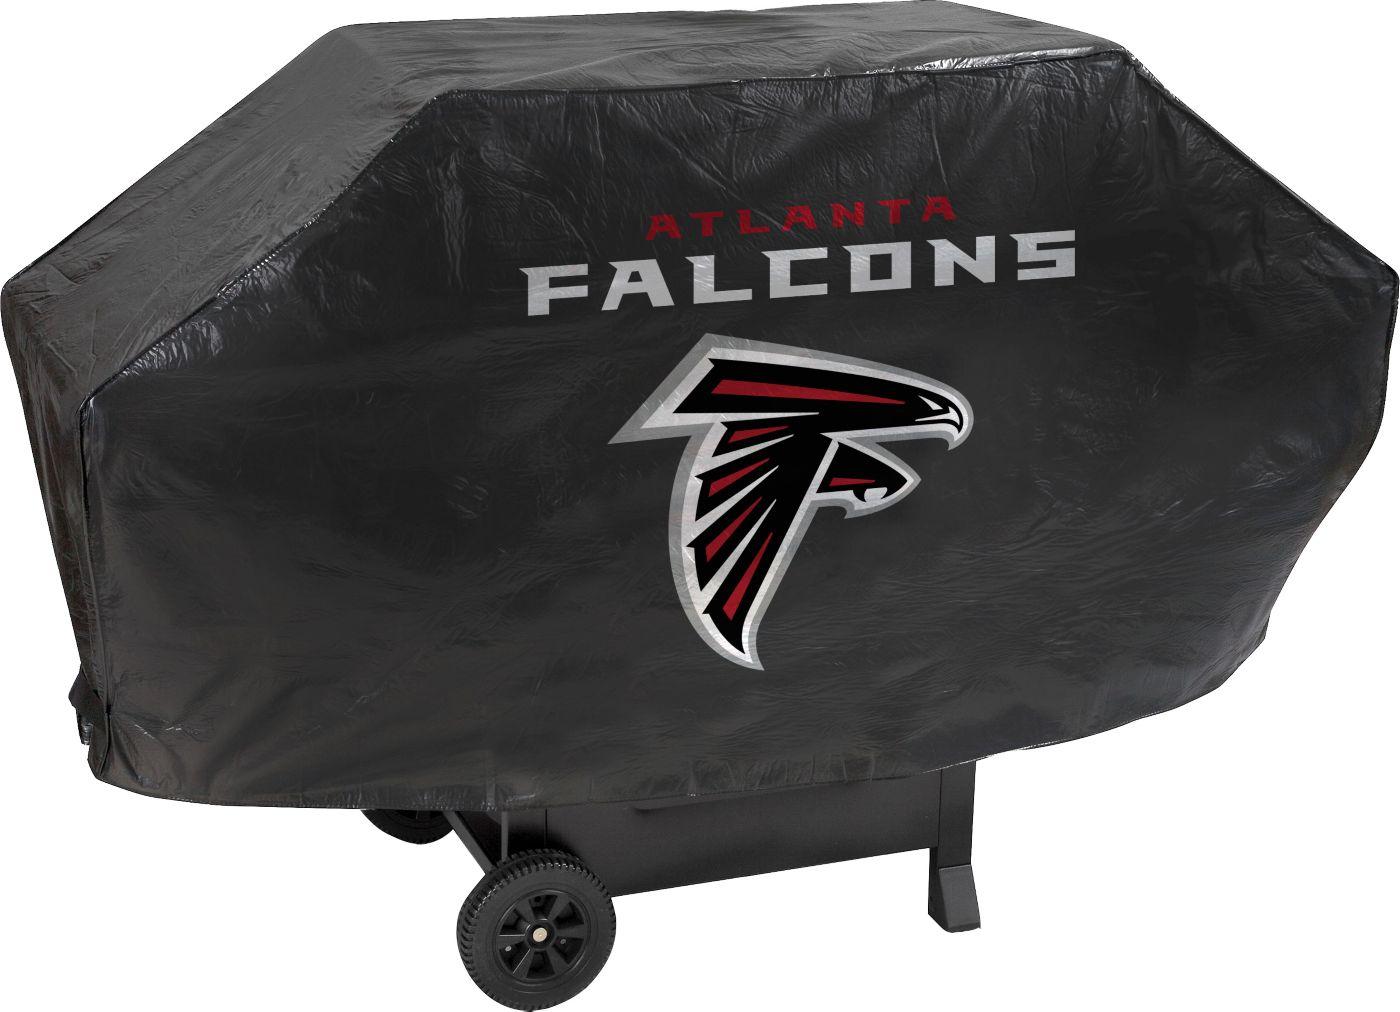 Rico NFL Atlanta Falcons Deluxe Grill Cover